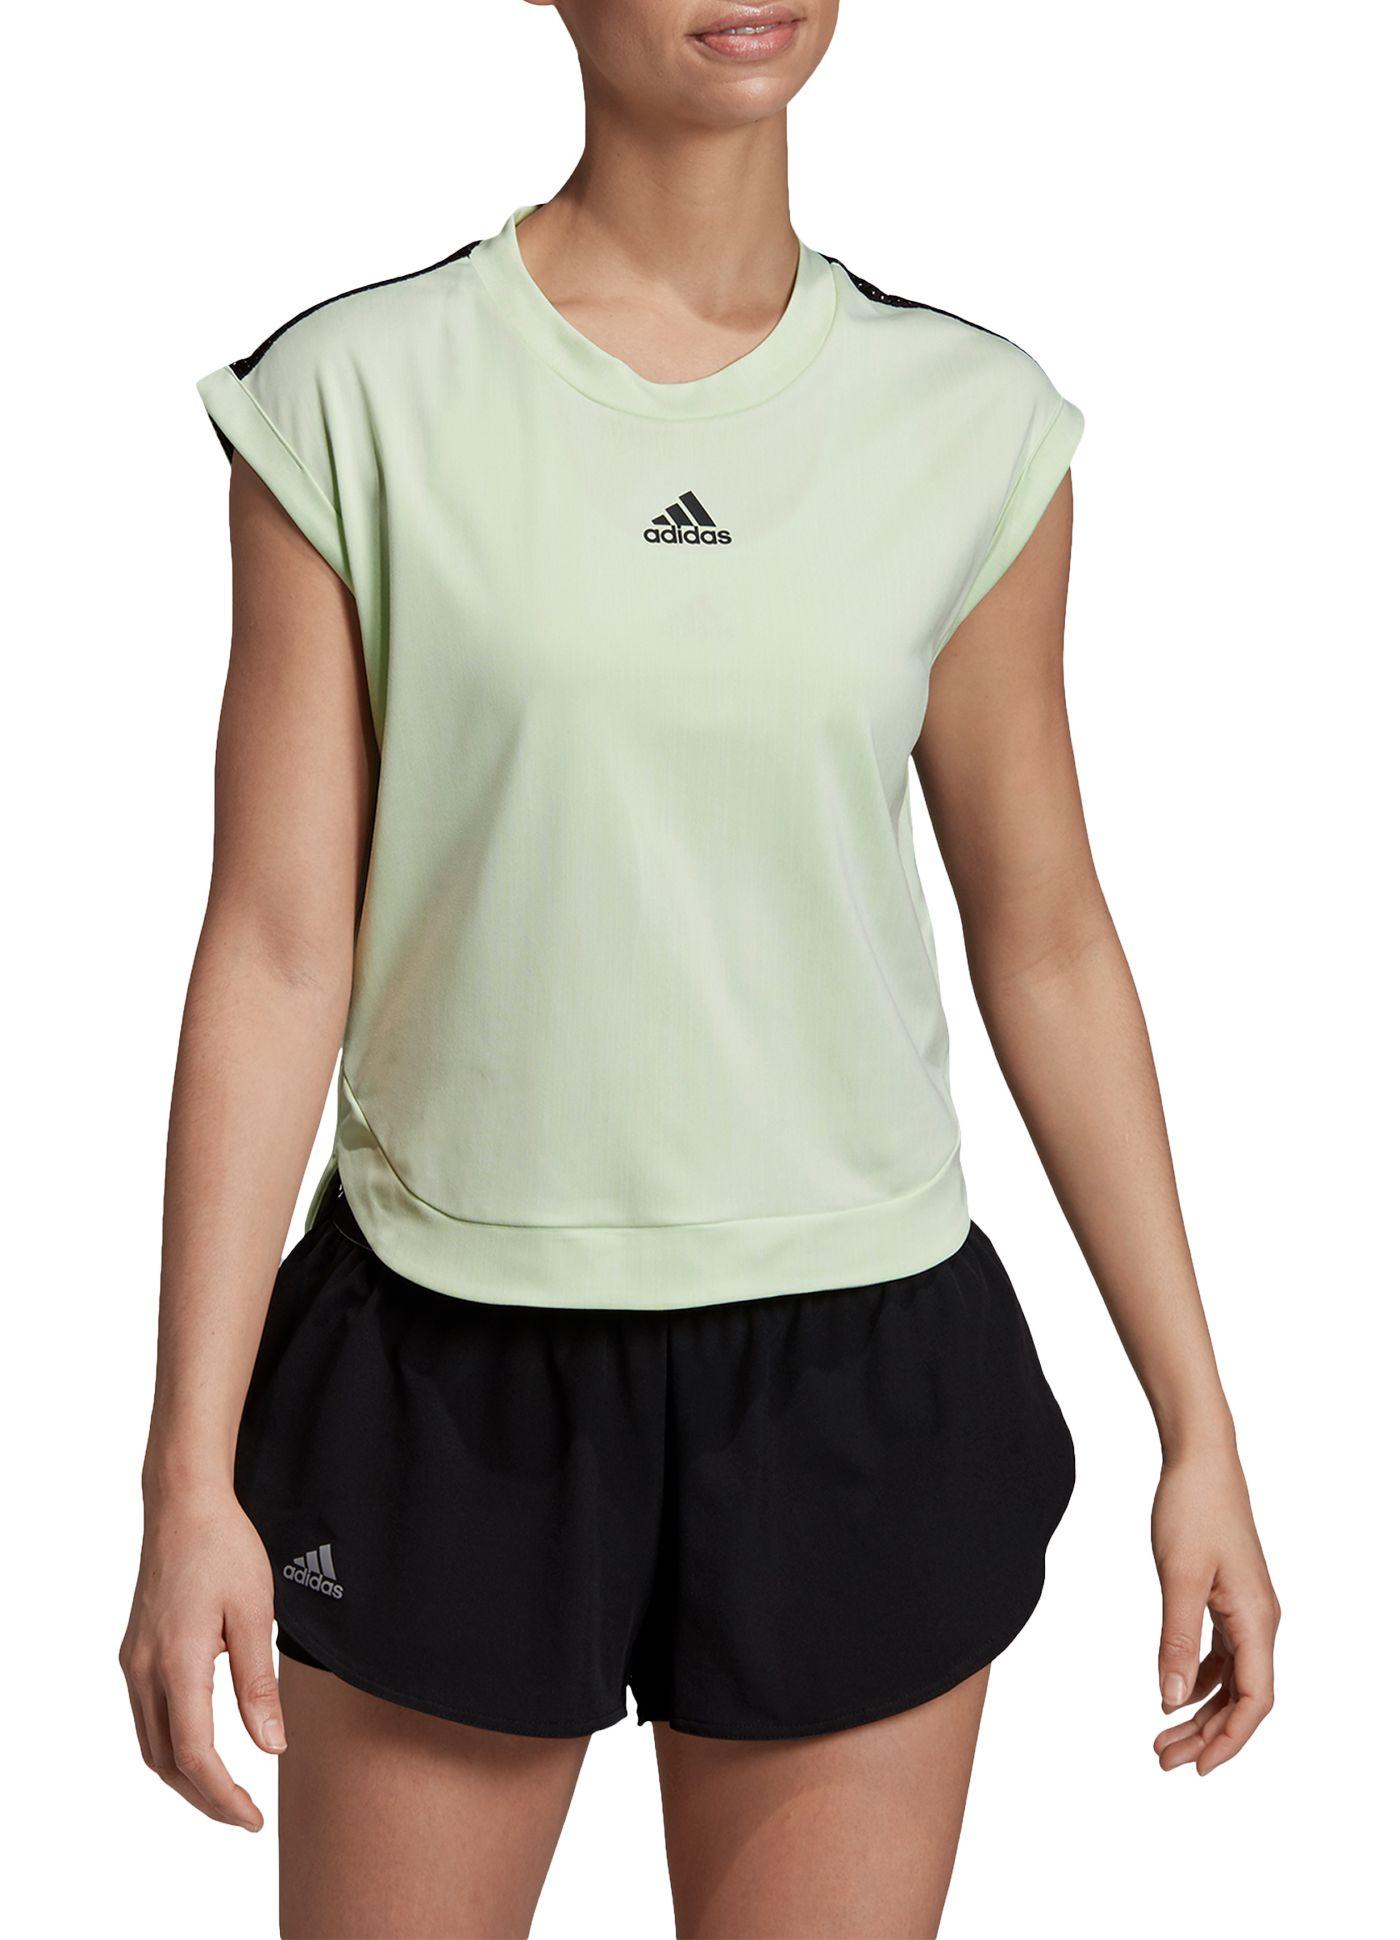 adidas Women's New York Tennis T-Shirt